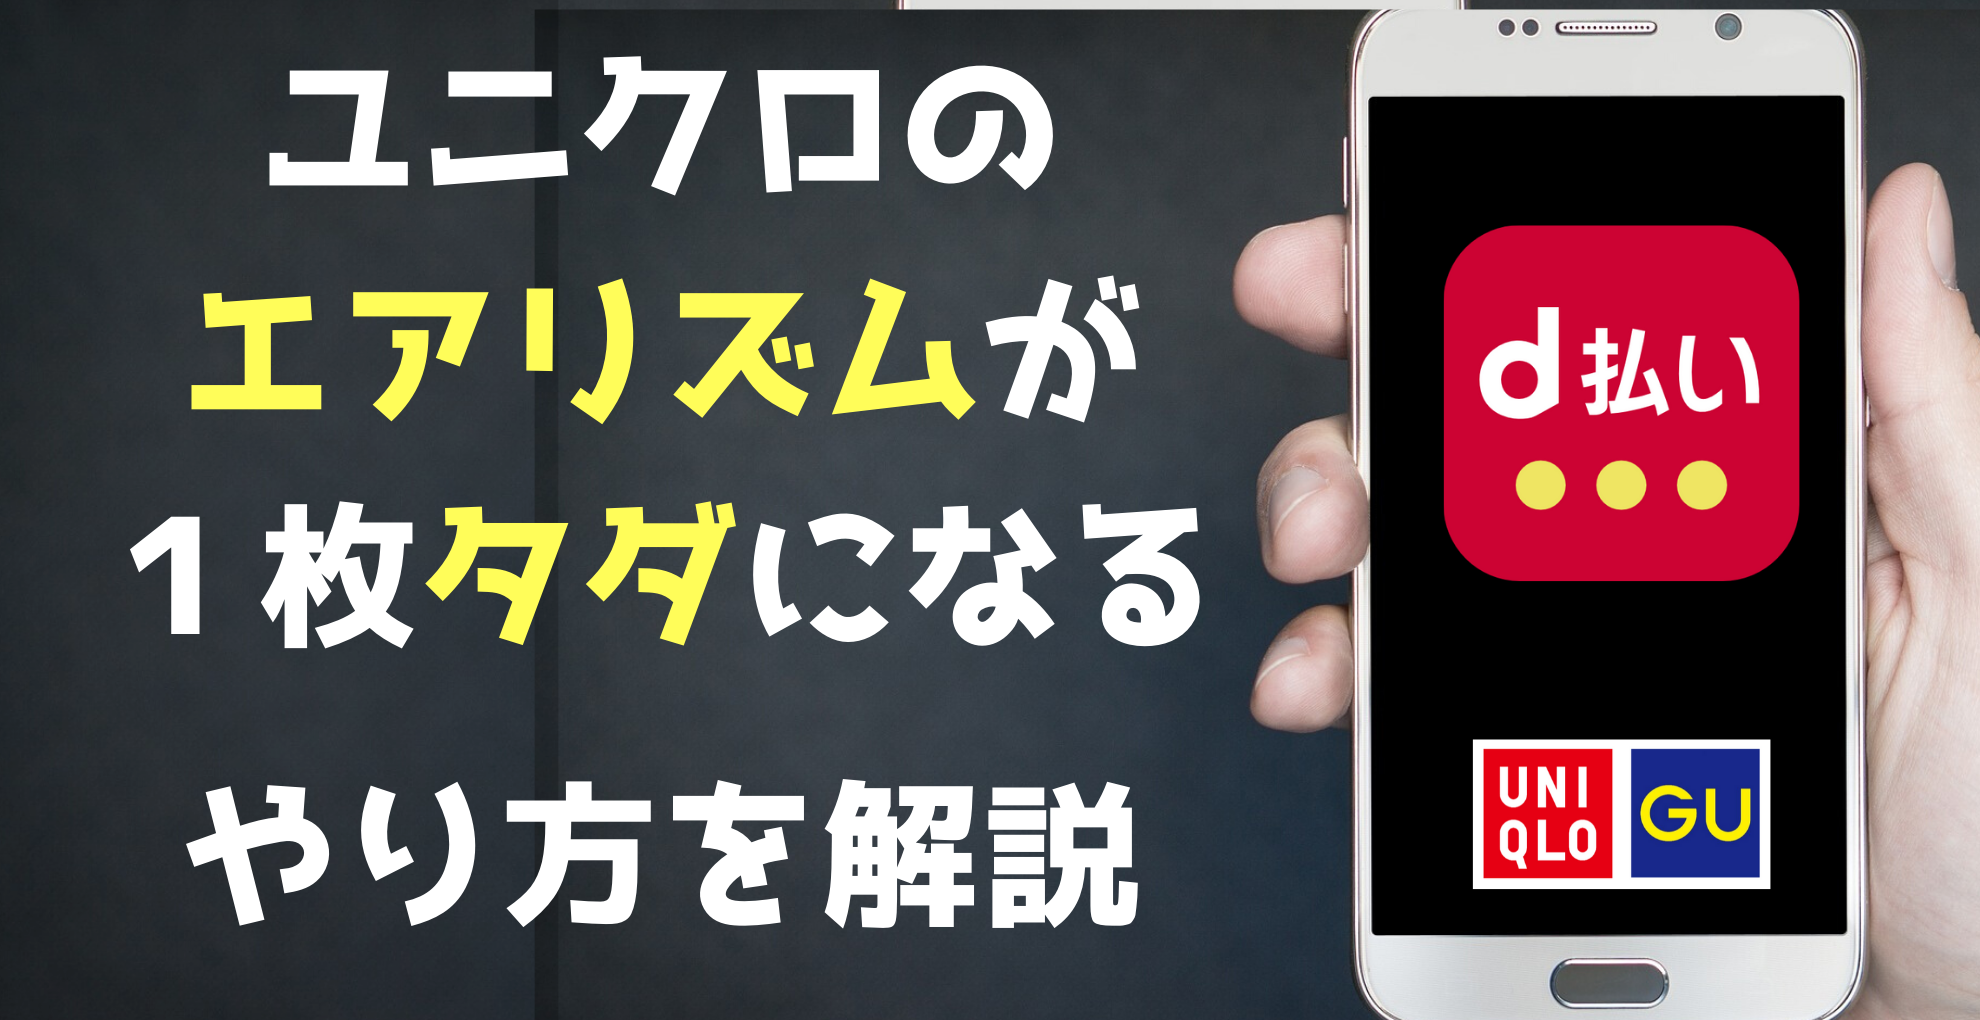 【d払い】ユニクロでエアリズムが1枚タダになるキャンペーン 利用方法を解説